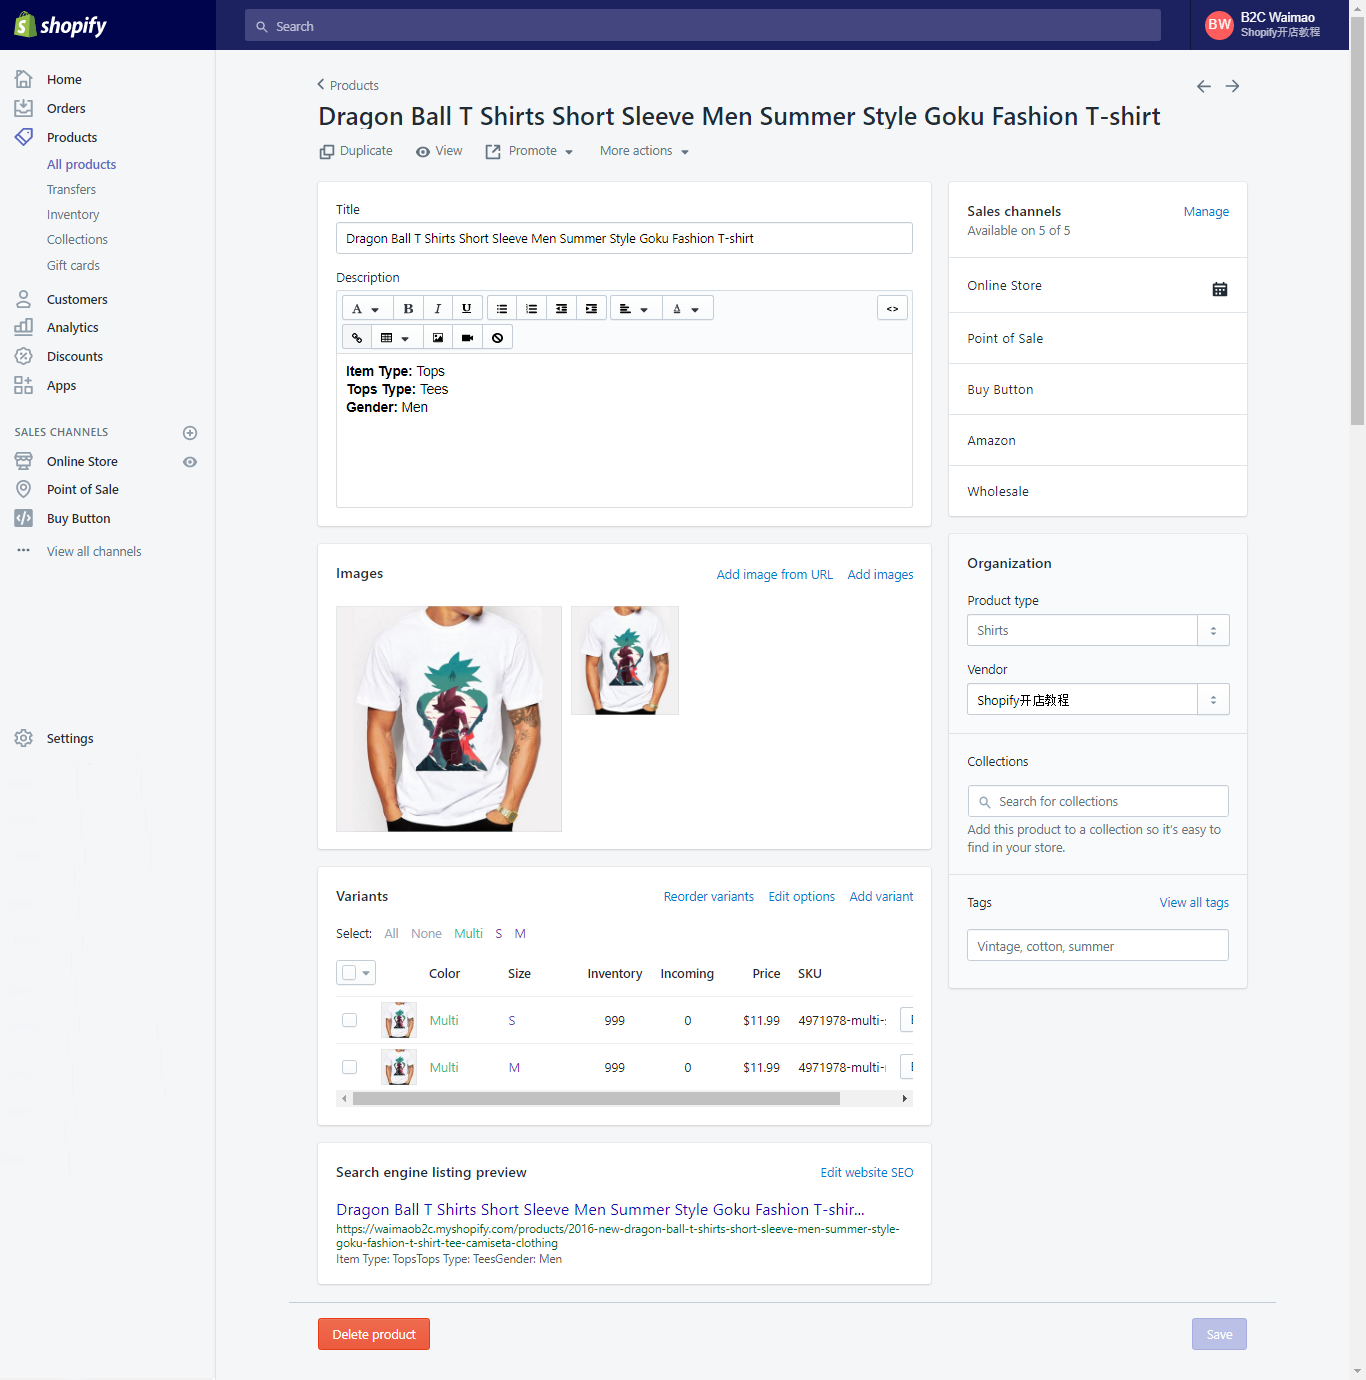 shopify平台注册开店零基础入门教程 – shopify产品单个上传 8 - Shopify平台注册开店零基础入门教程 – Shopify产品单个上传 – 销售渠道Sales Channels设置